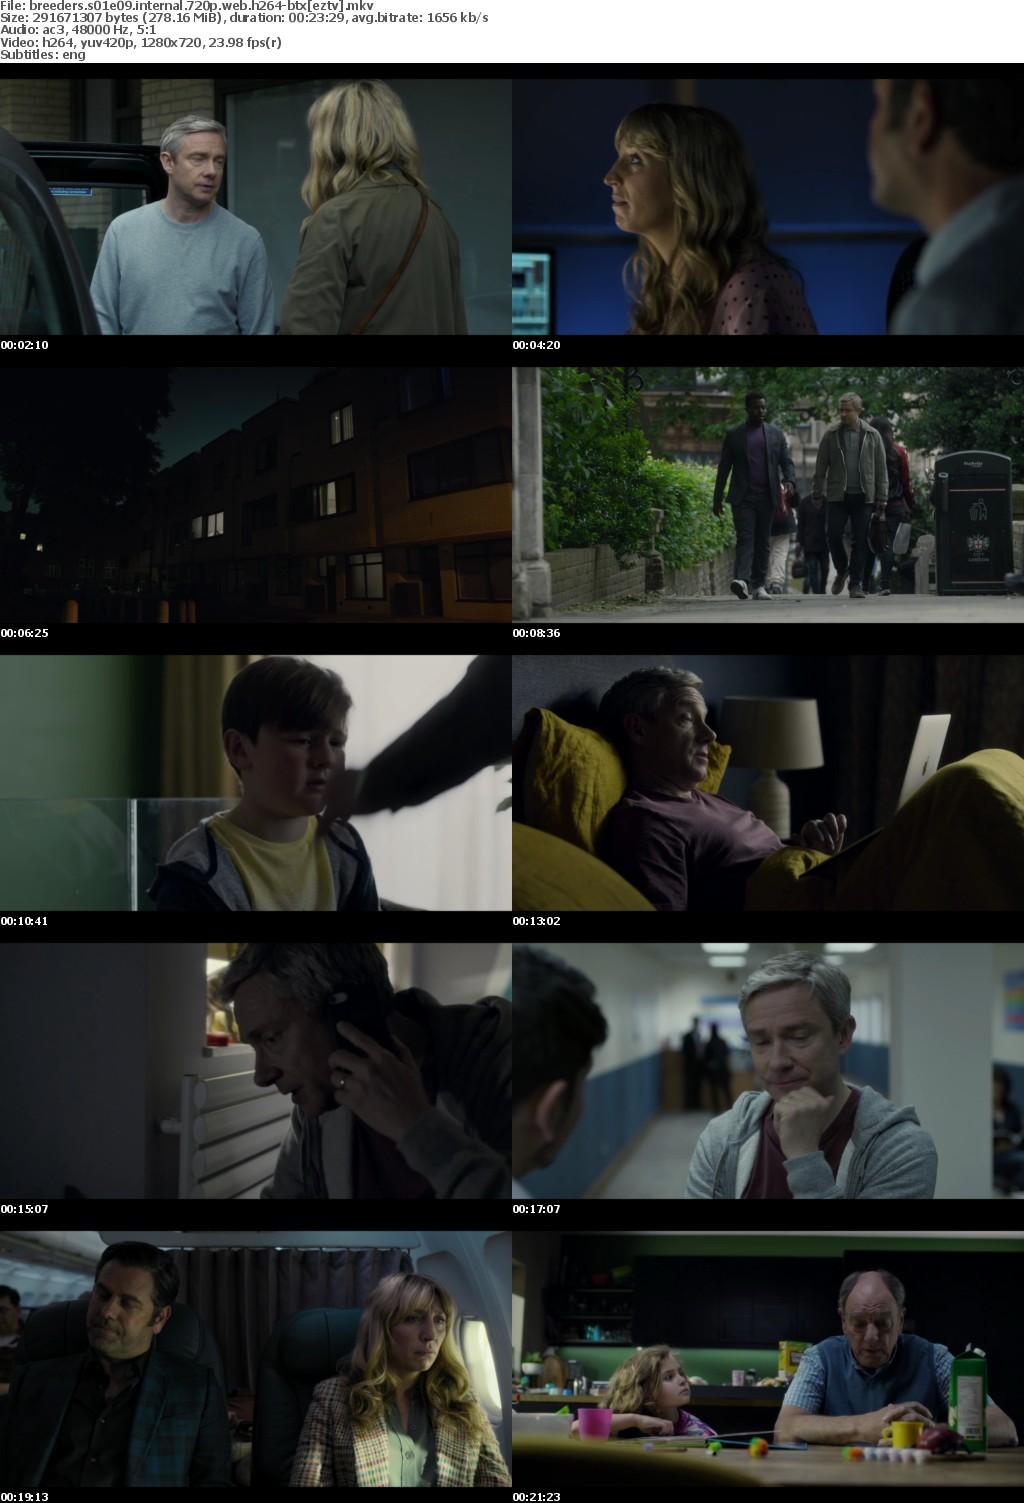 Breeders S01E09 INTERNAL 720p WEB H264-BTX